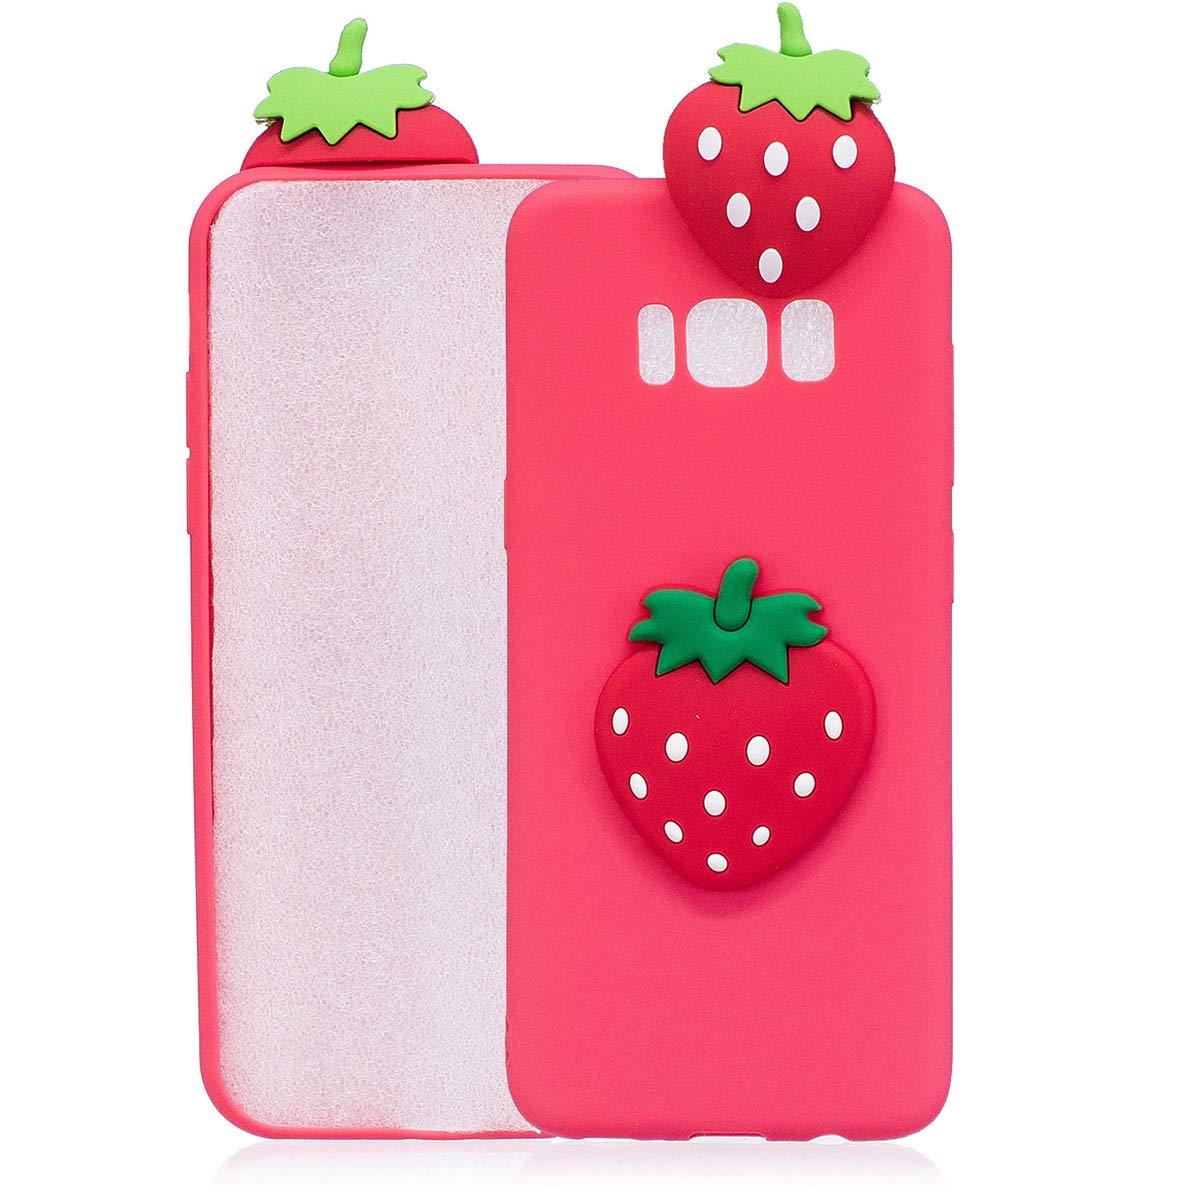 WUBAOUK Cover Compatibile con Samsung S8 Cute Strawberry Pattern 3D Cartoon Soft Silicone Cover Fruits Animals Design 3D Silicone Case